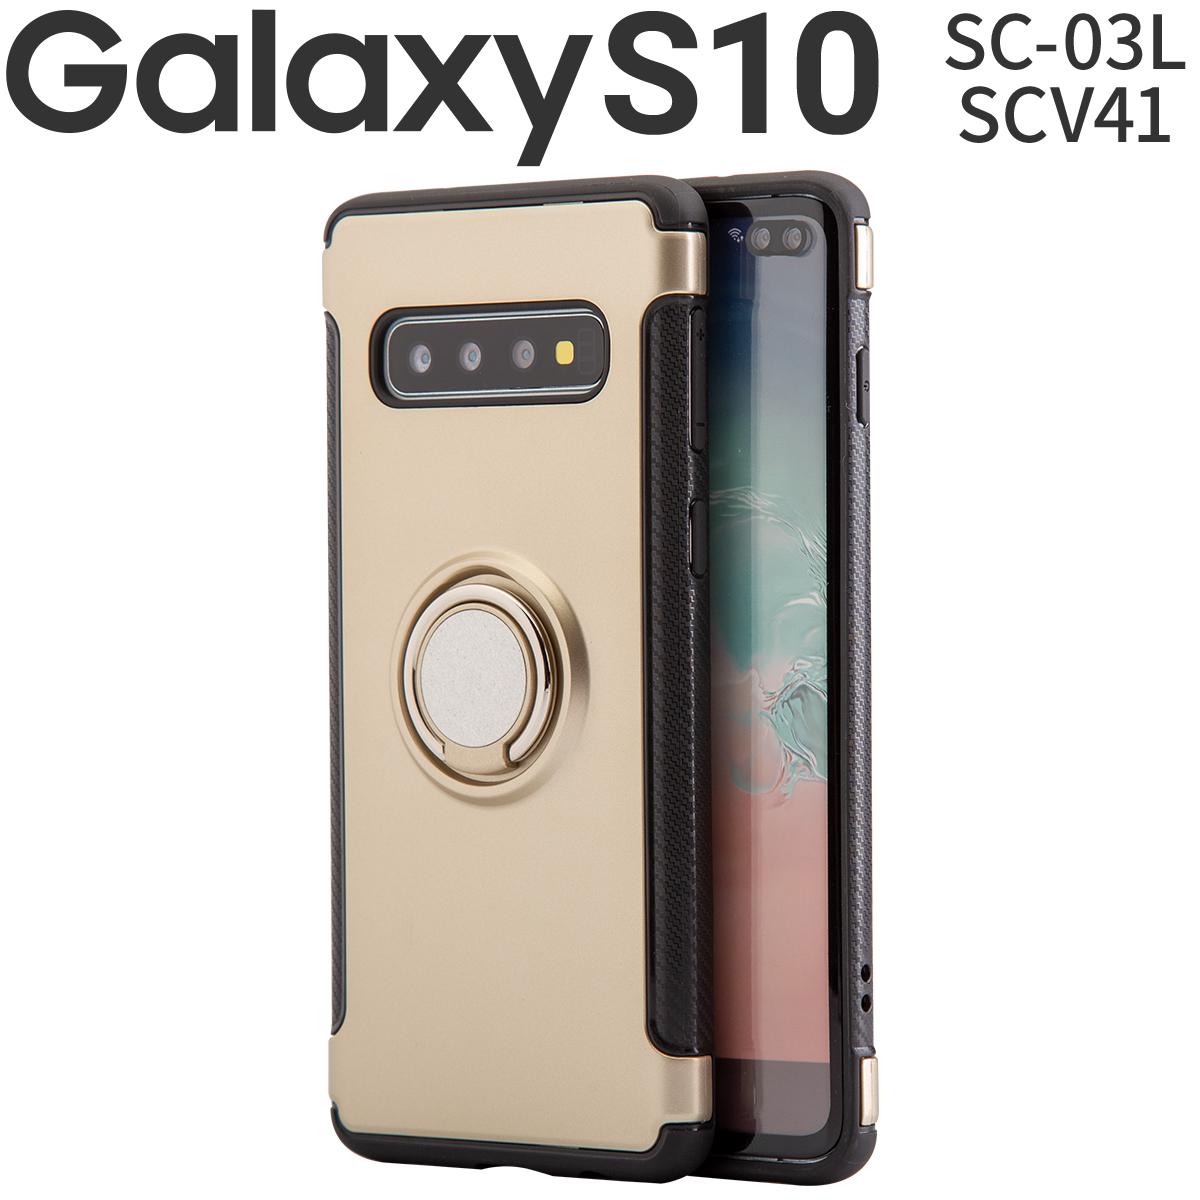 Galaxy S10 リング付き耐衝撃ケース